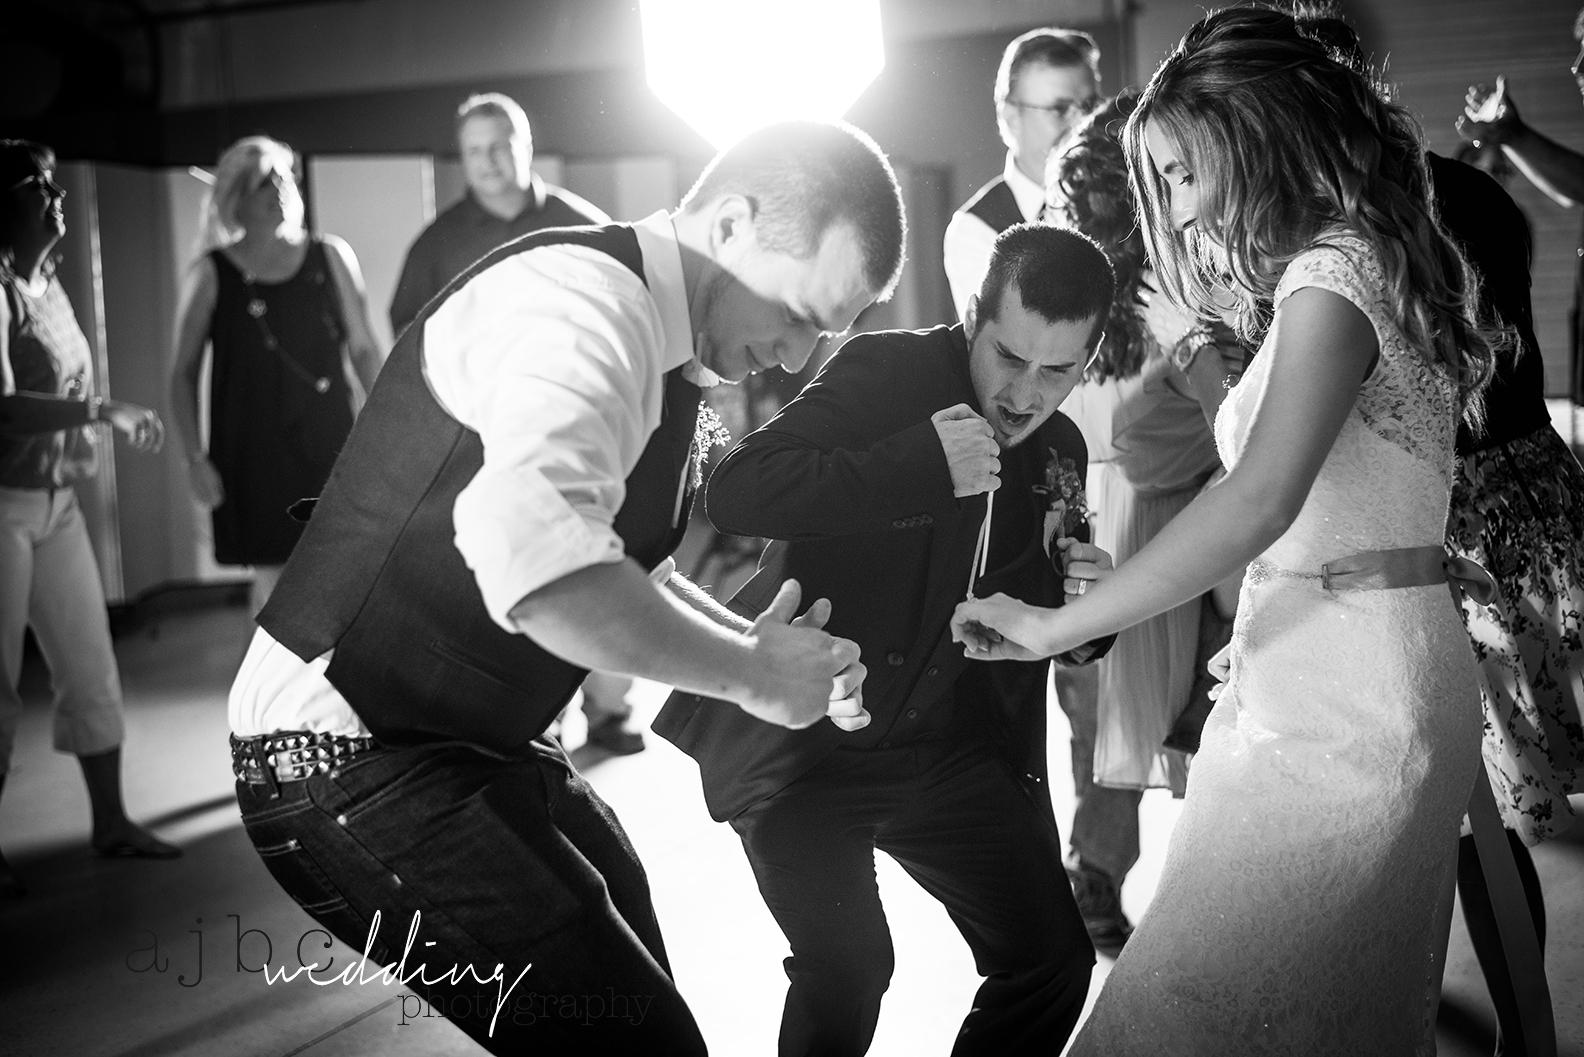 ajbcphotography-port-huron-michigan-wedding-photographer-outdoors-summer-wedding-country-wedding-wadhams-michigan-bride-vintage-wedding6.jpg